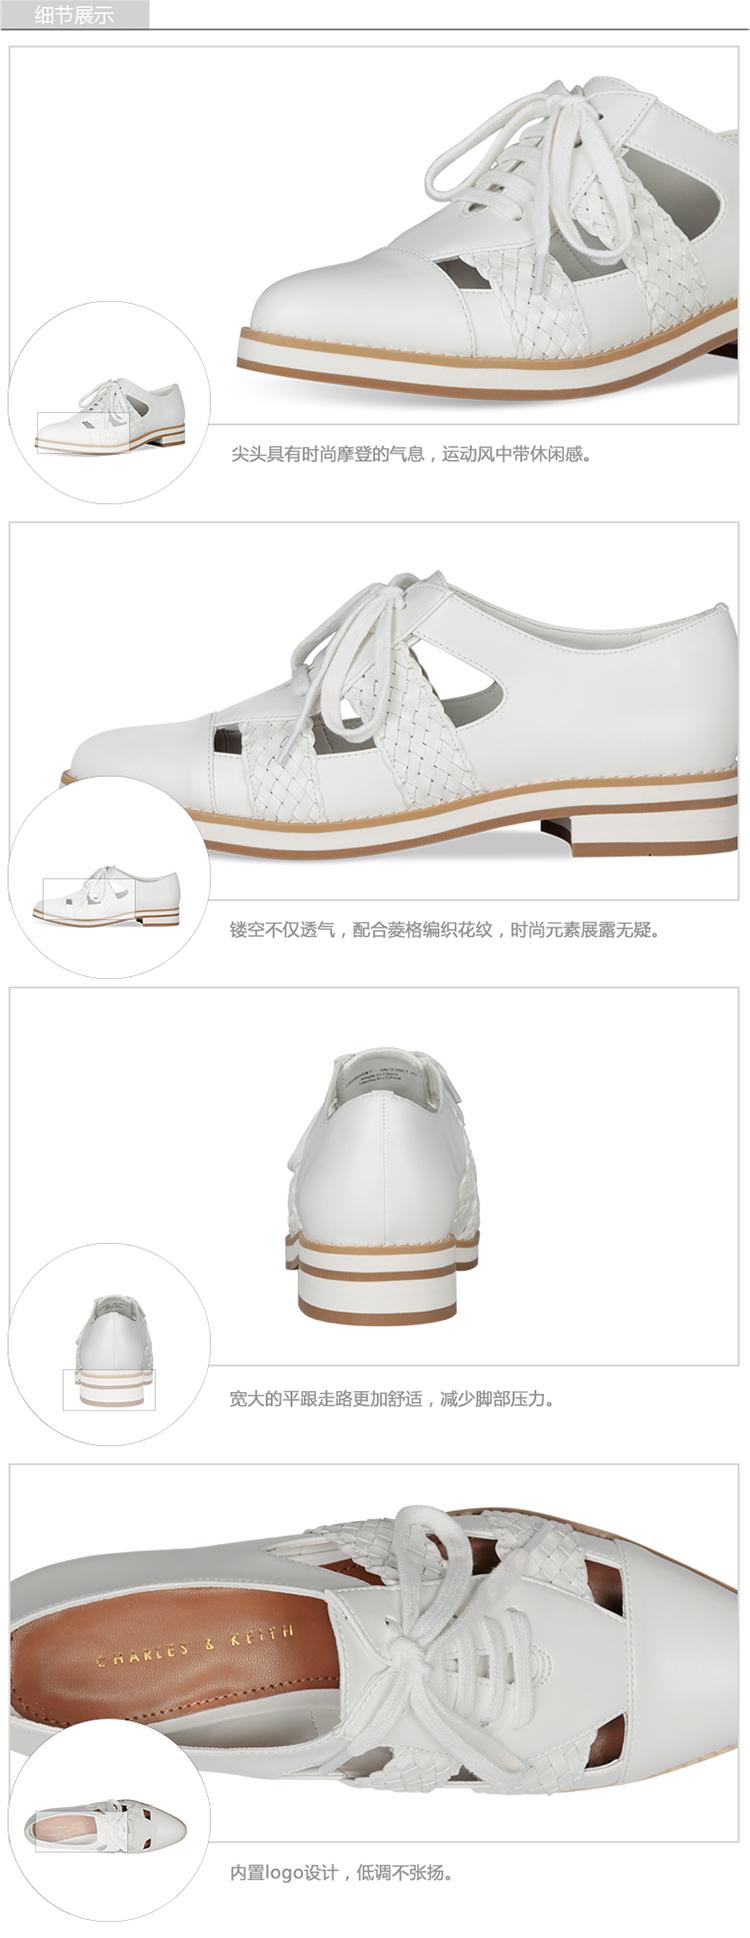 Giày nữ Charles & Keith CHARLESKEITHCK1 70580087 41 CK1-70580087 - ảnh 6